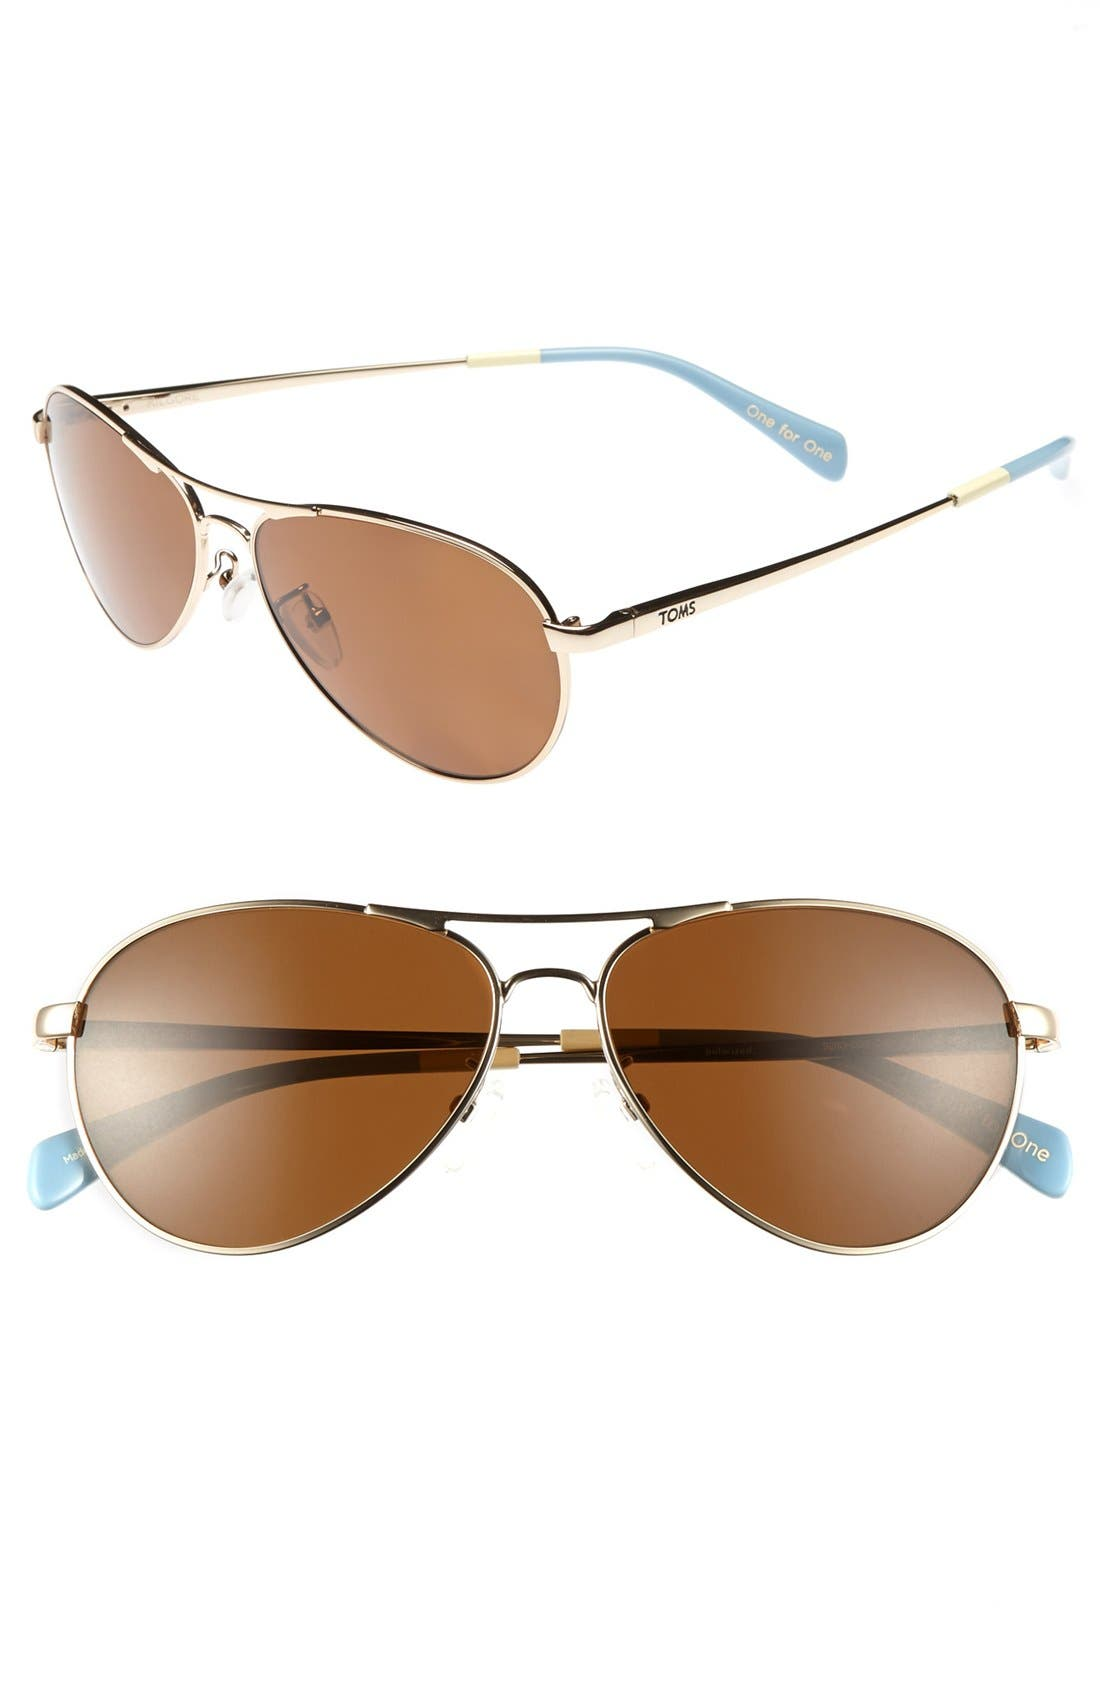 Alternate Image 1 Selected - TOMS 'Kilgore' 57mm Polarized Aviator Sunglasses